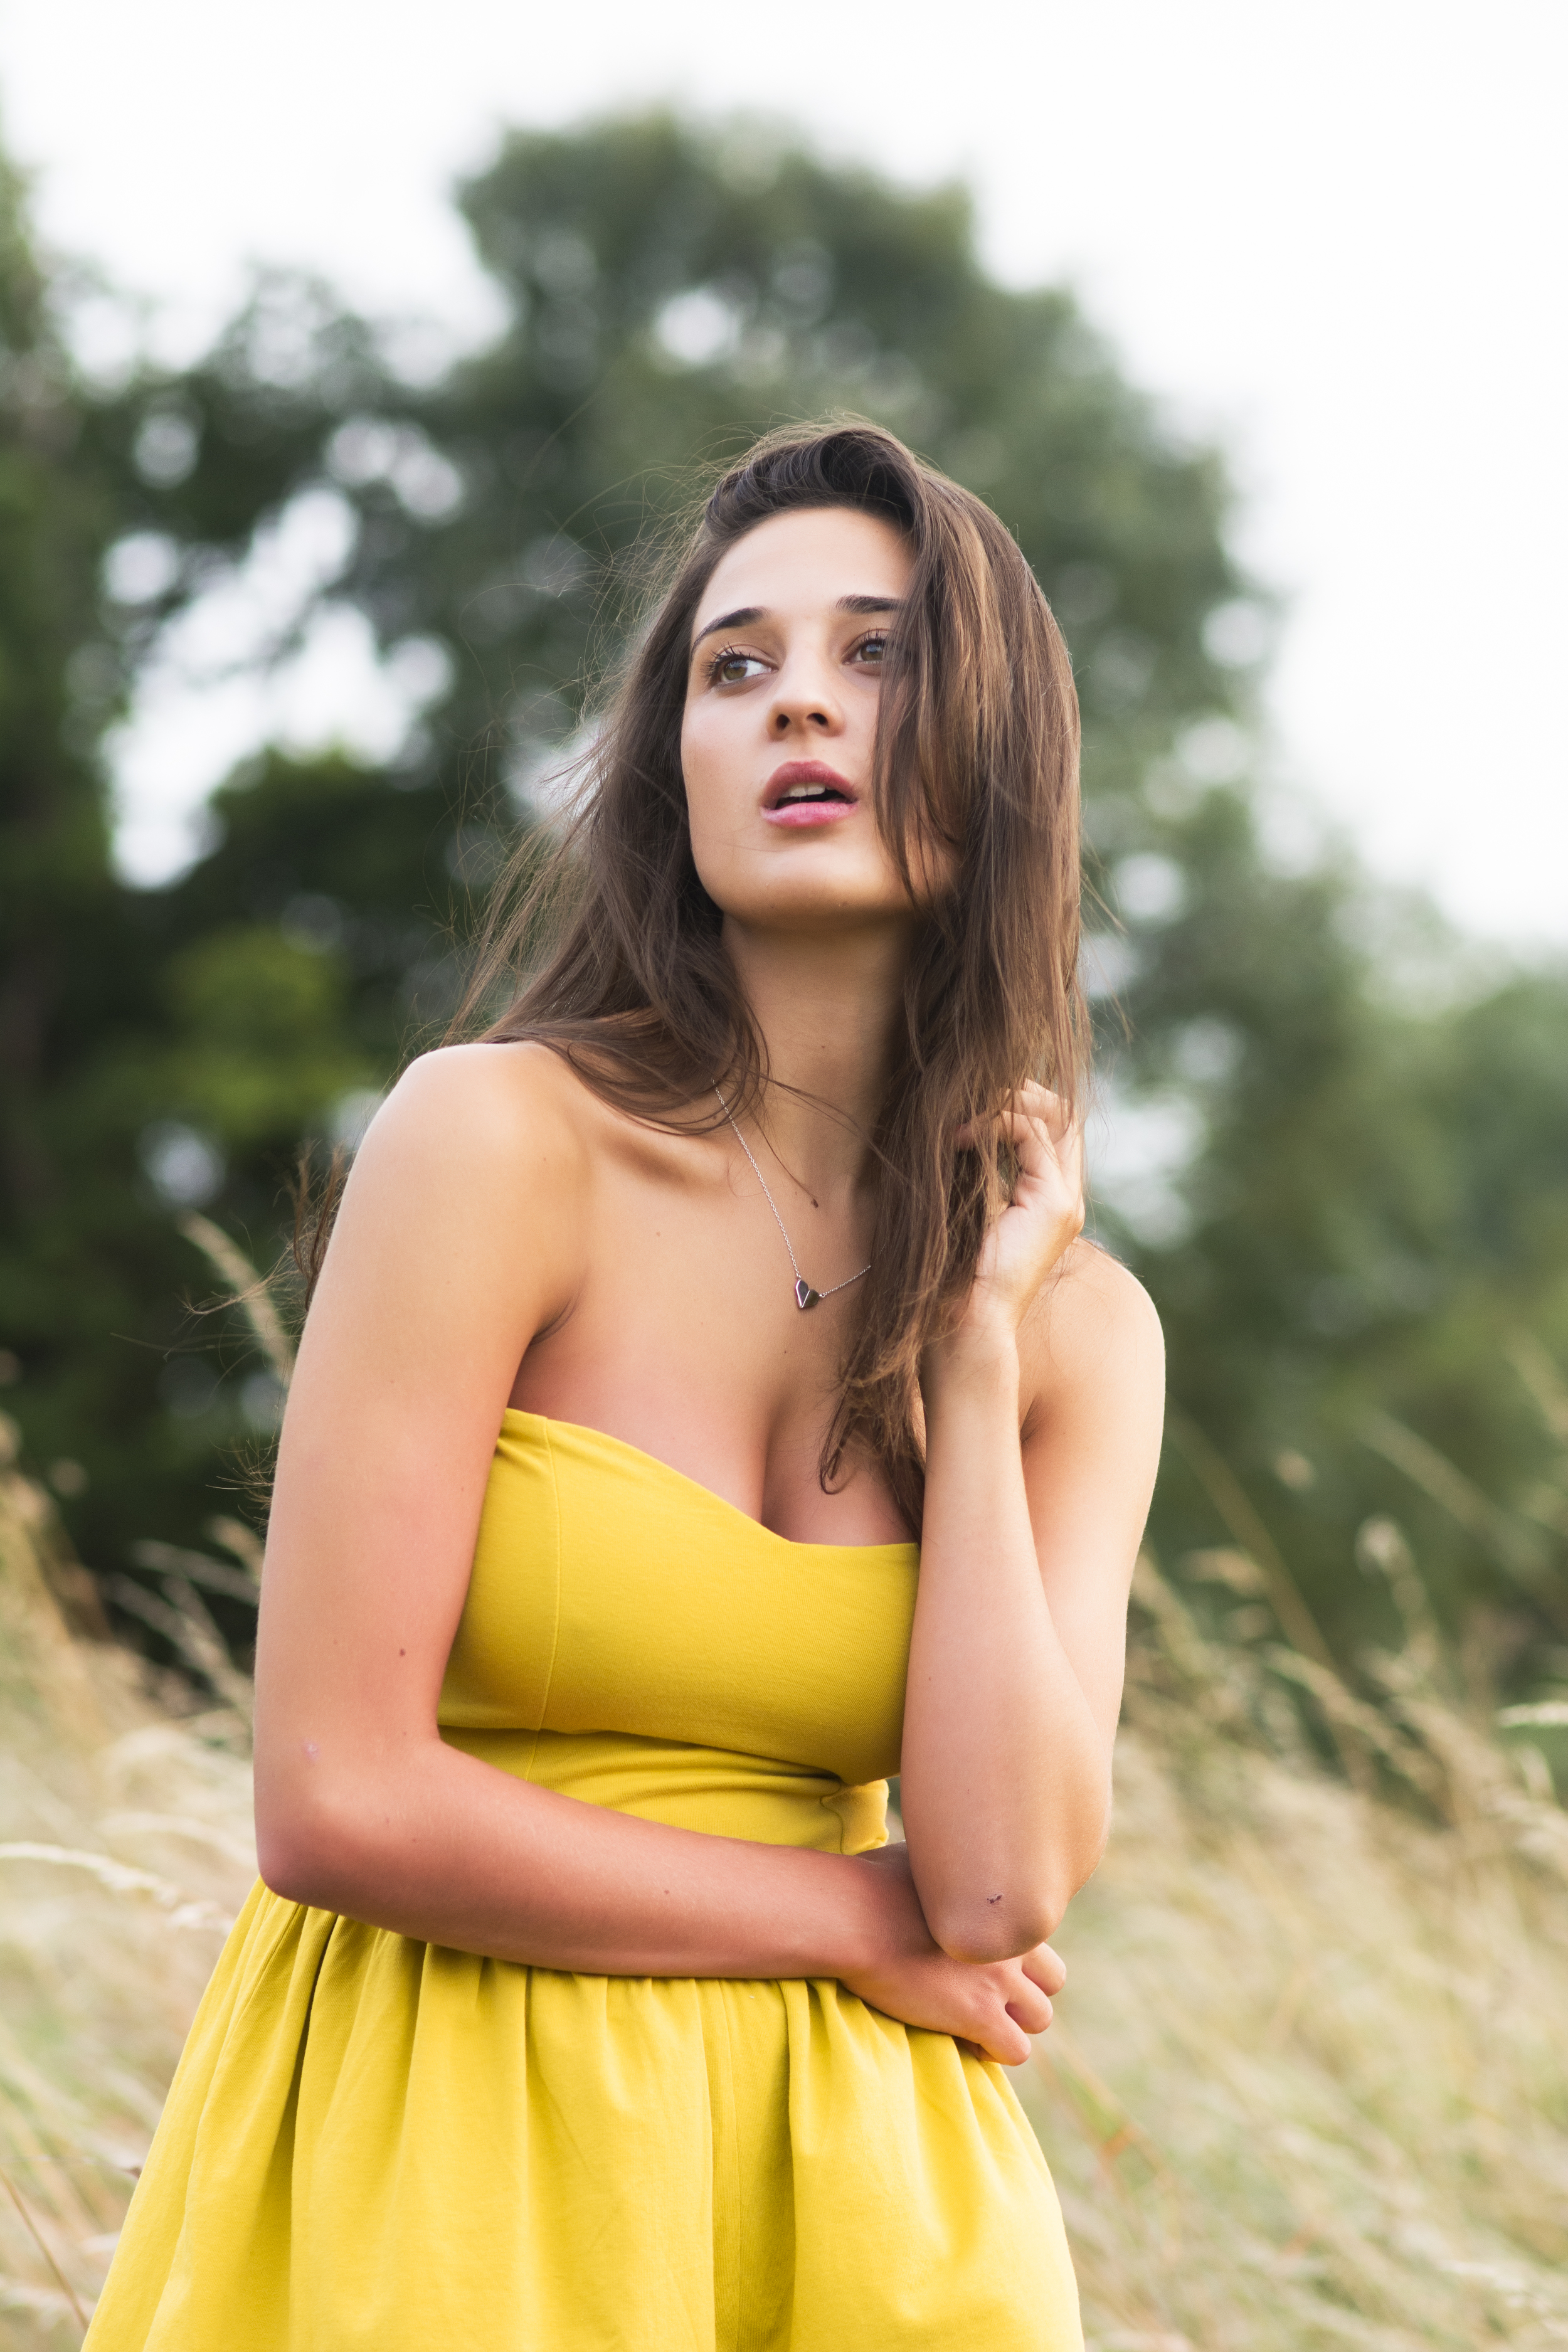 Fashion shoot in summer meadows